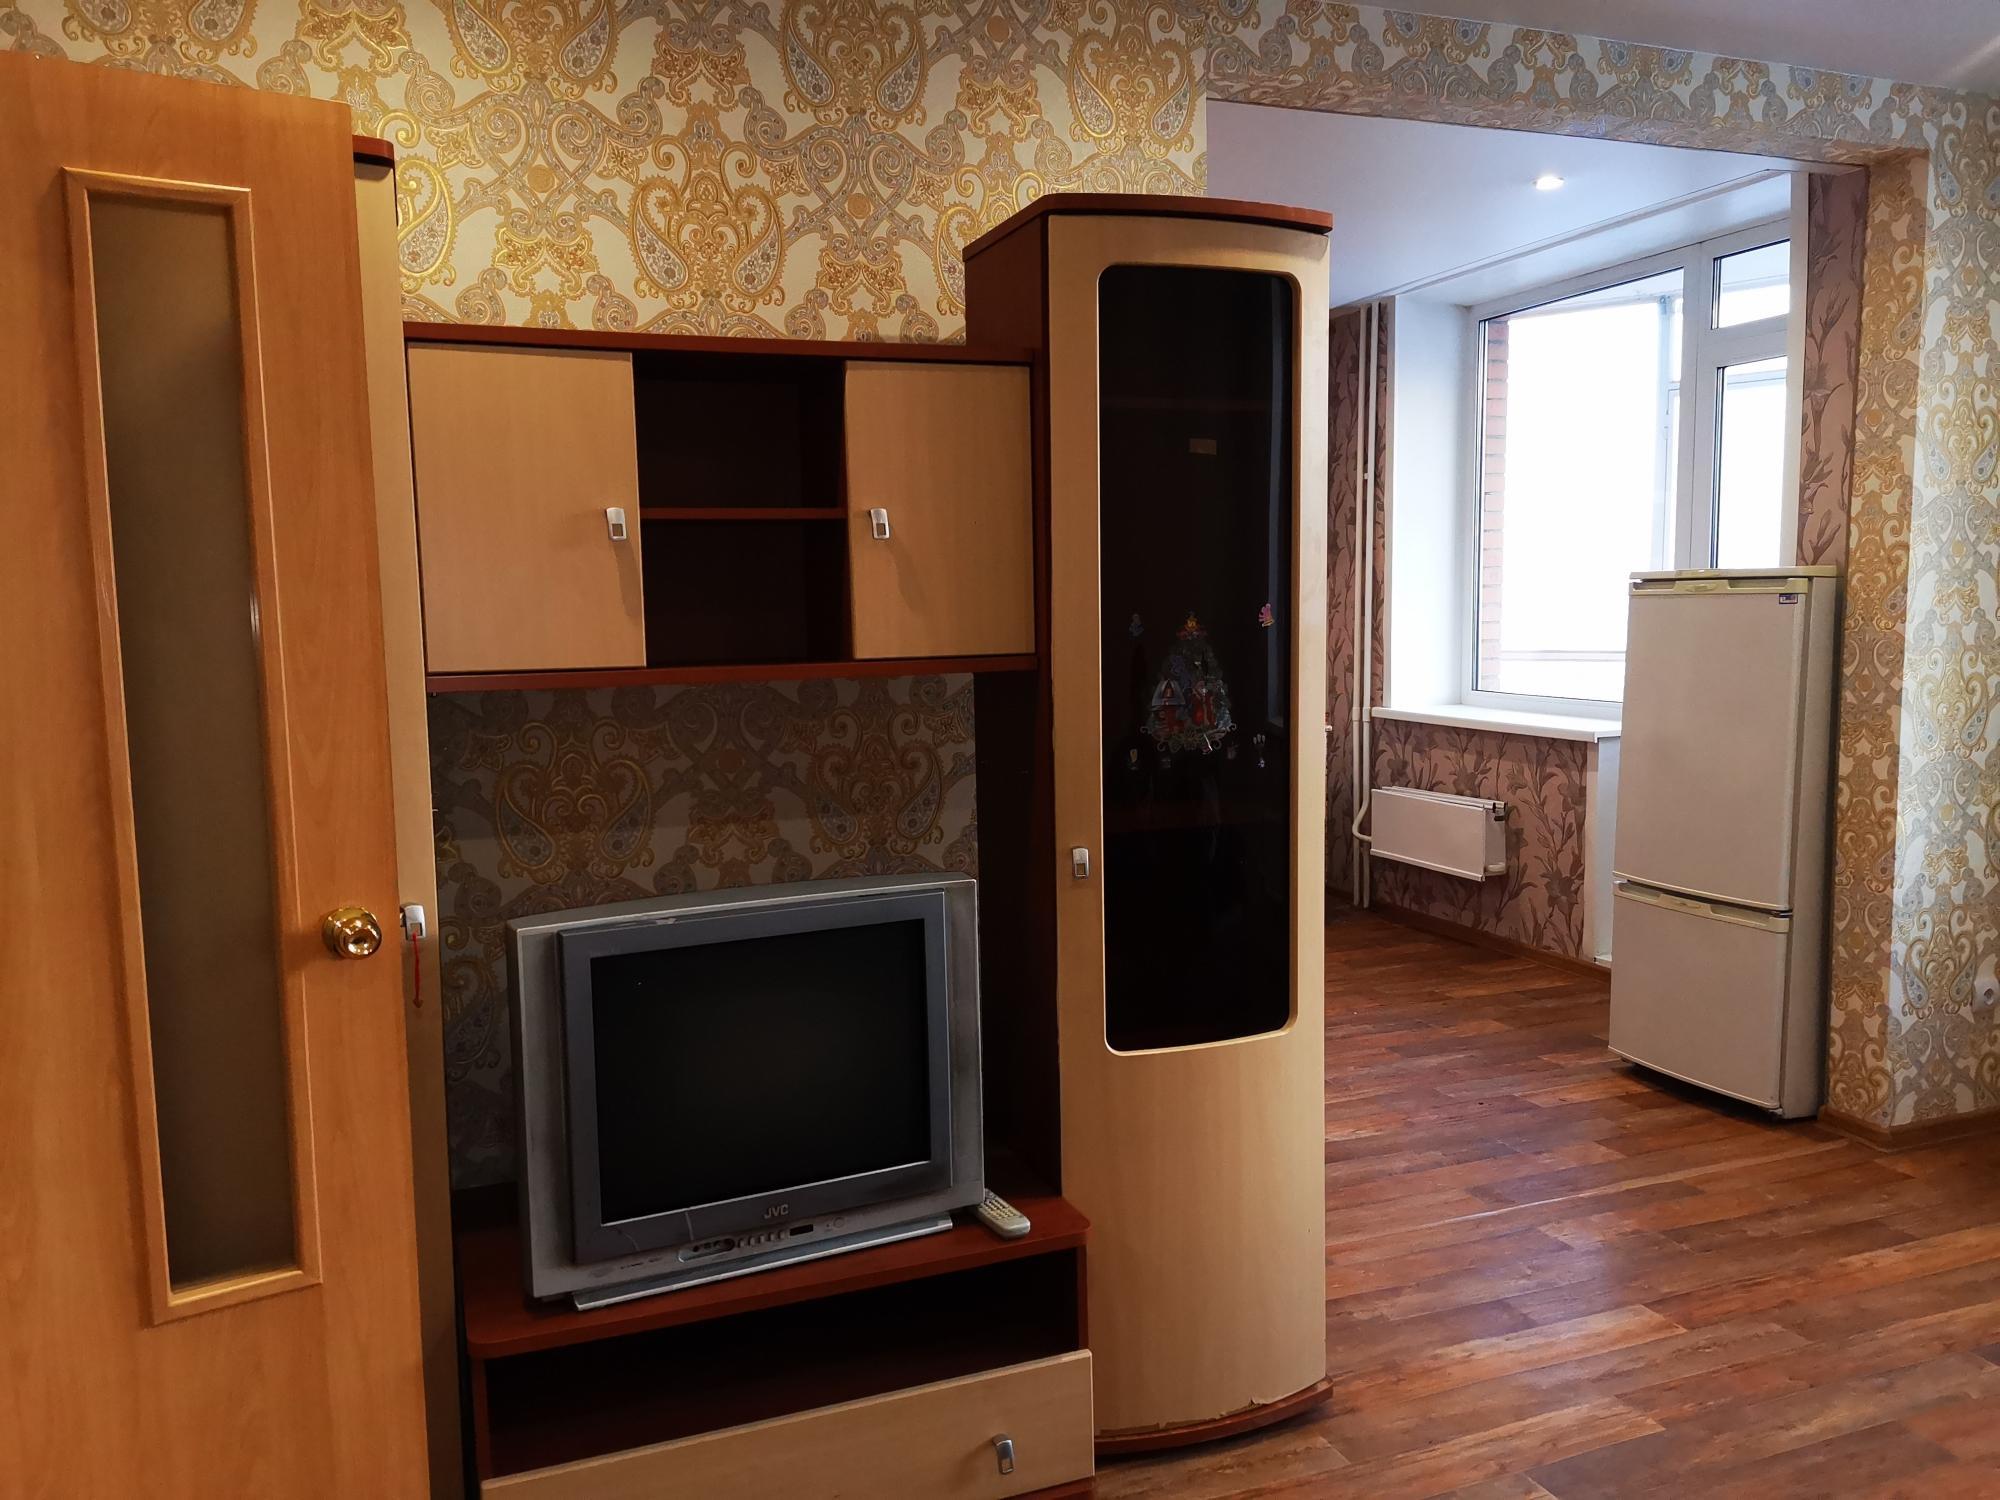 1к квартира Ястынское поле, улица Мате Залки, 37 | 16000 | аренда в Красноярске фото 3